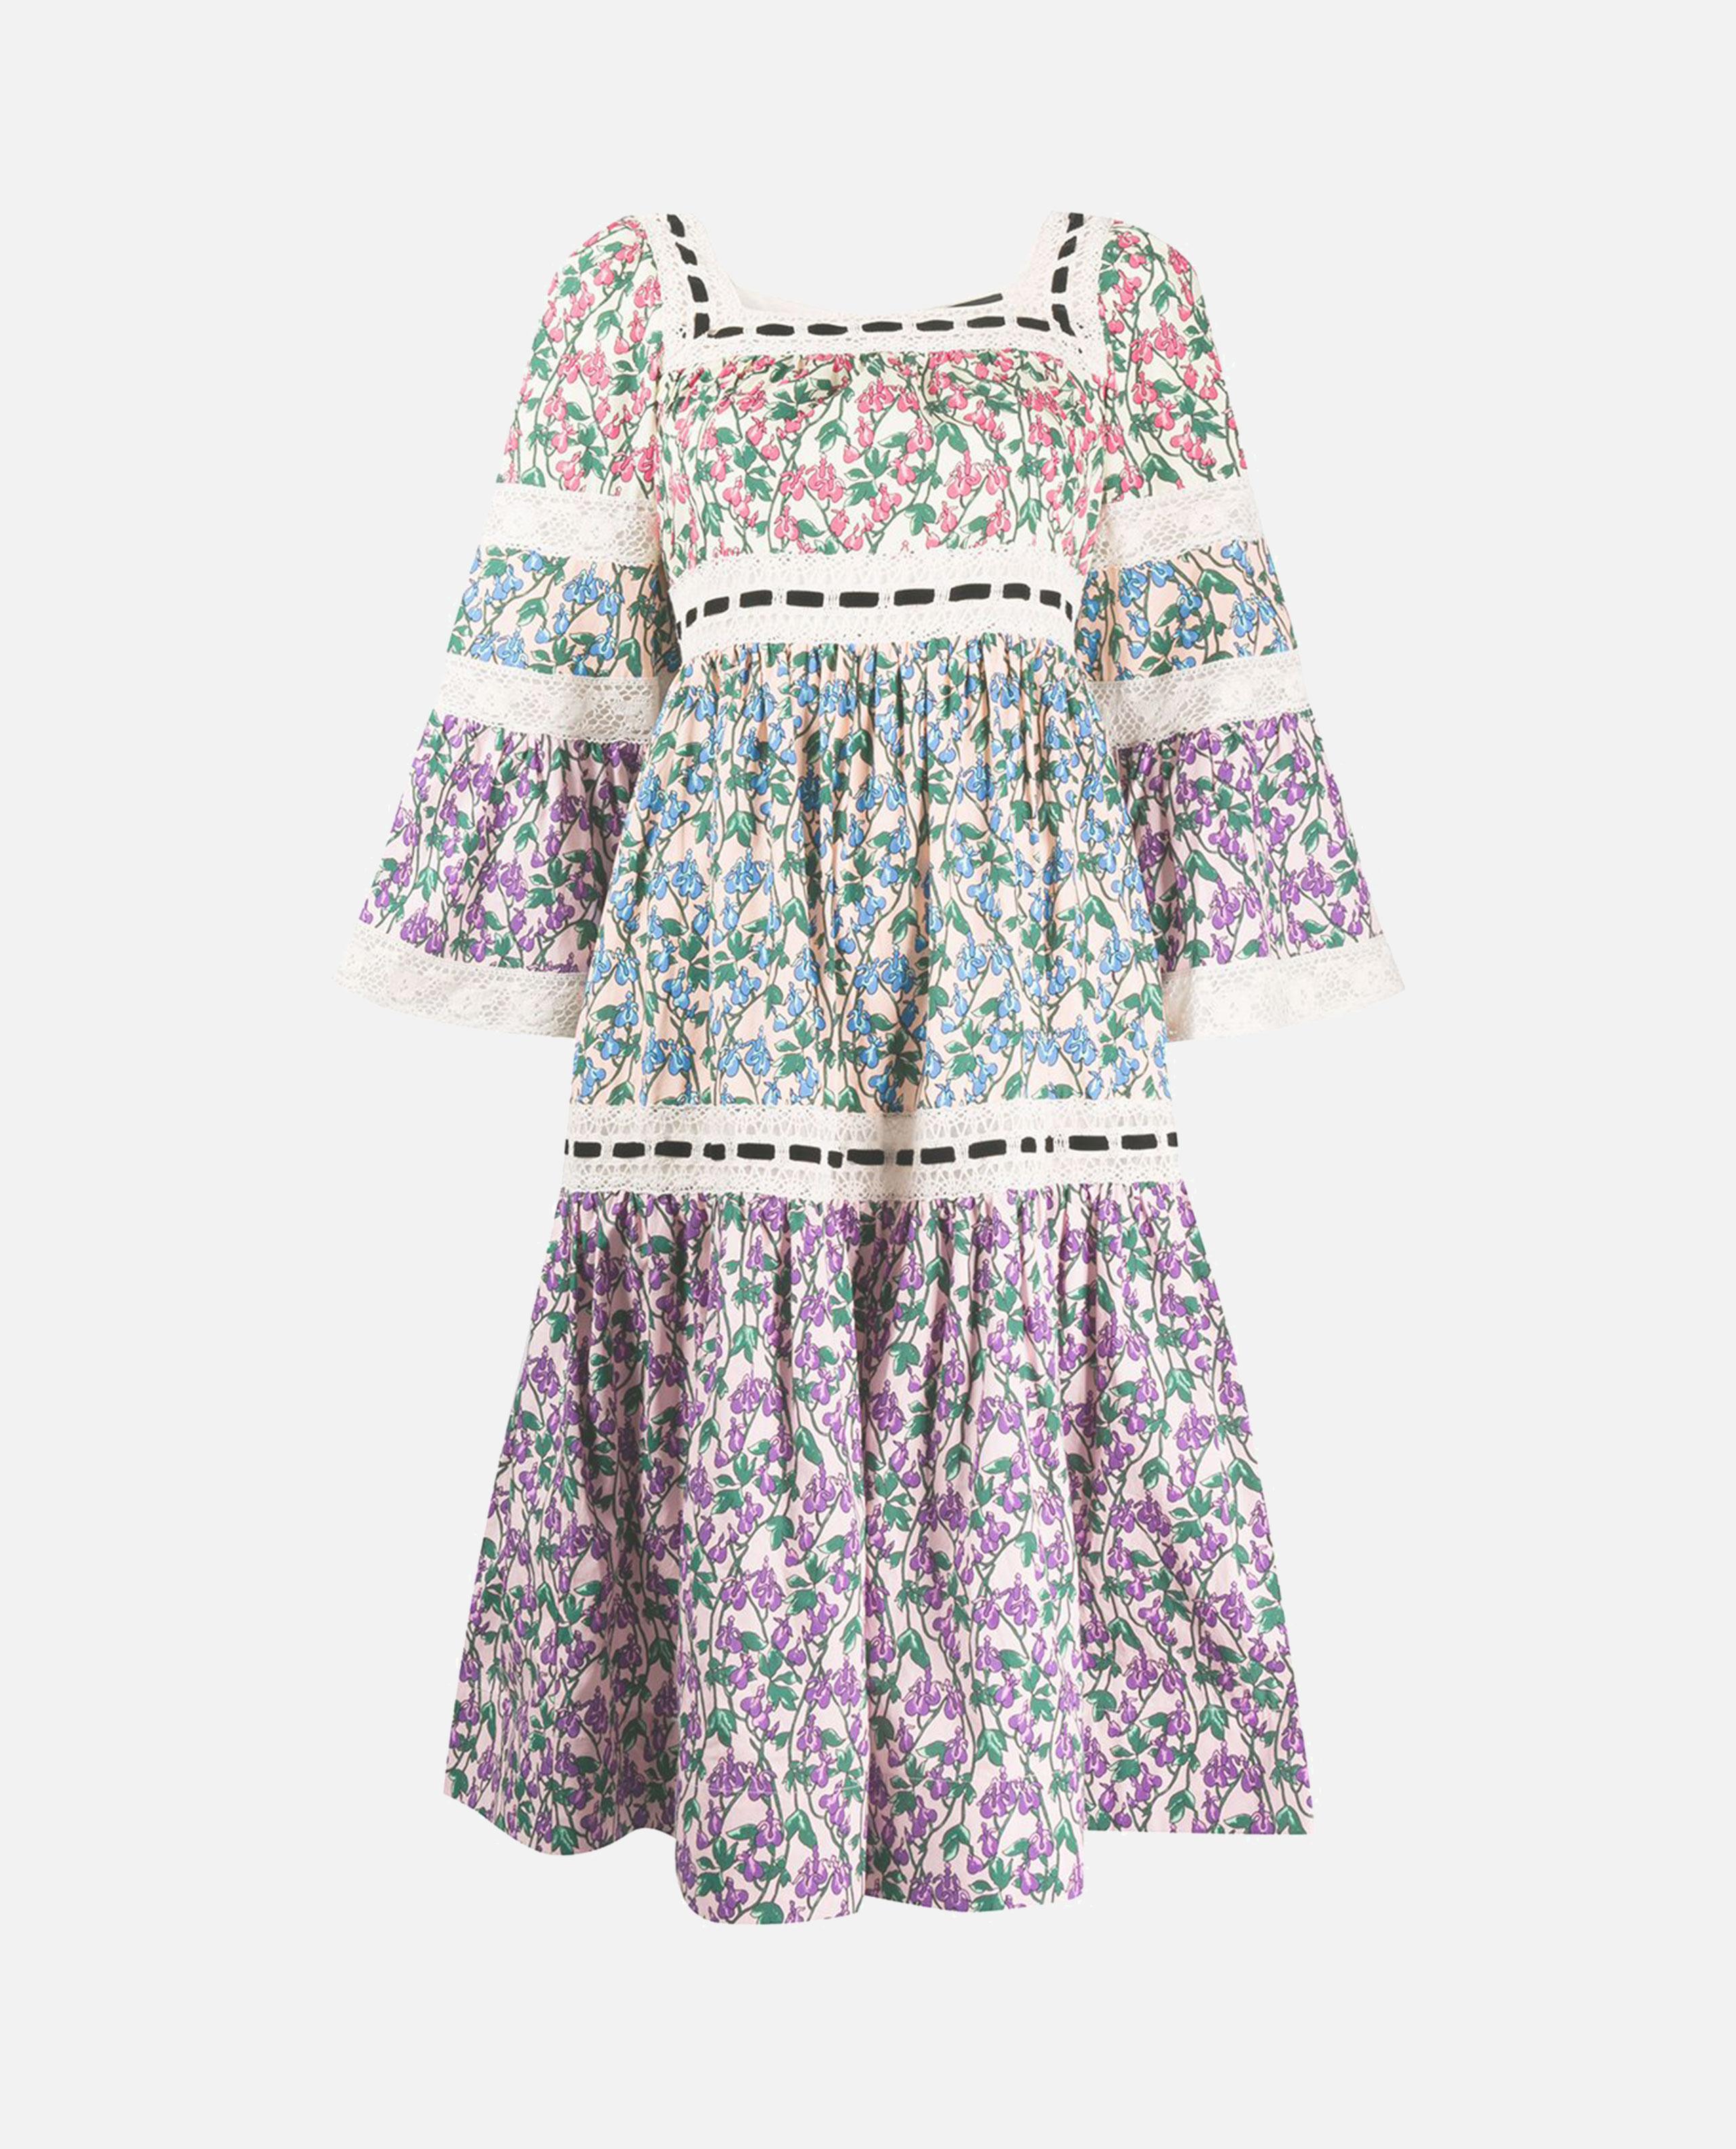 Multicolored floral cotton dress